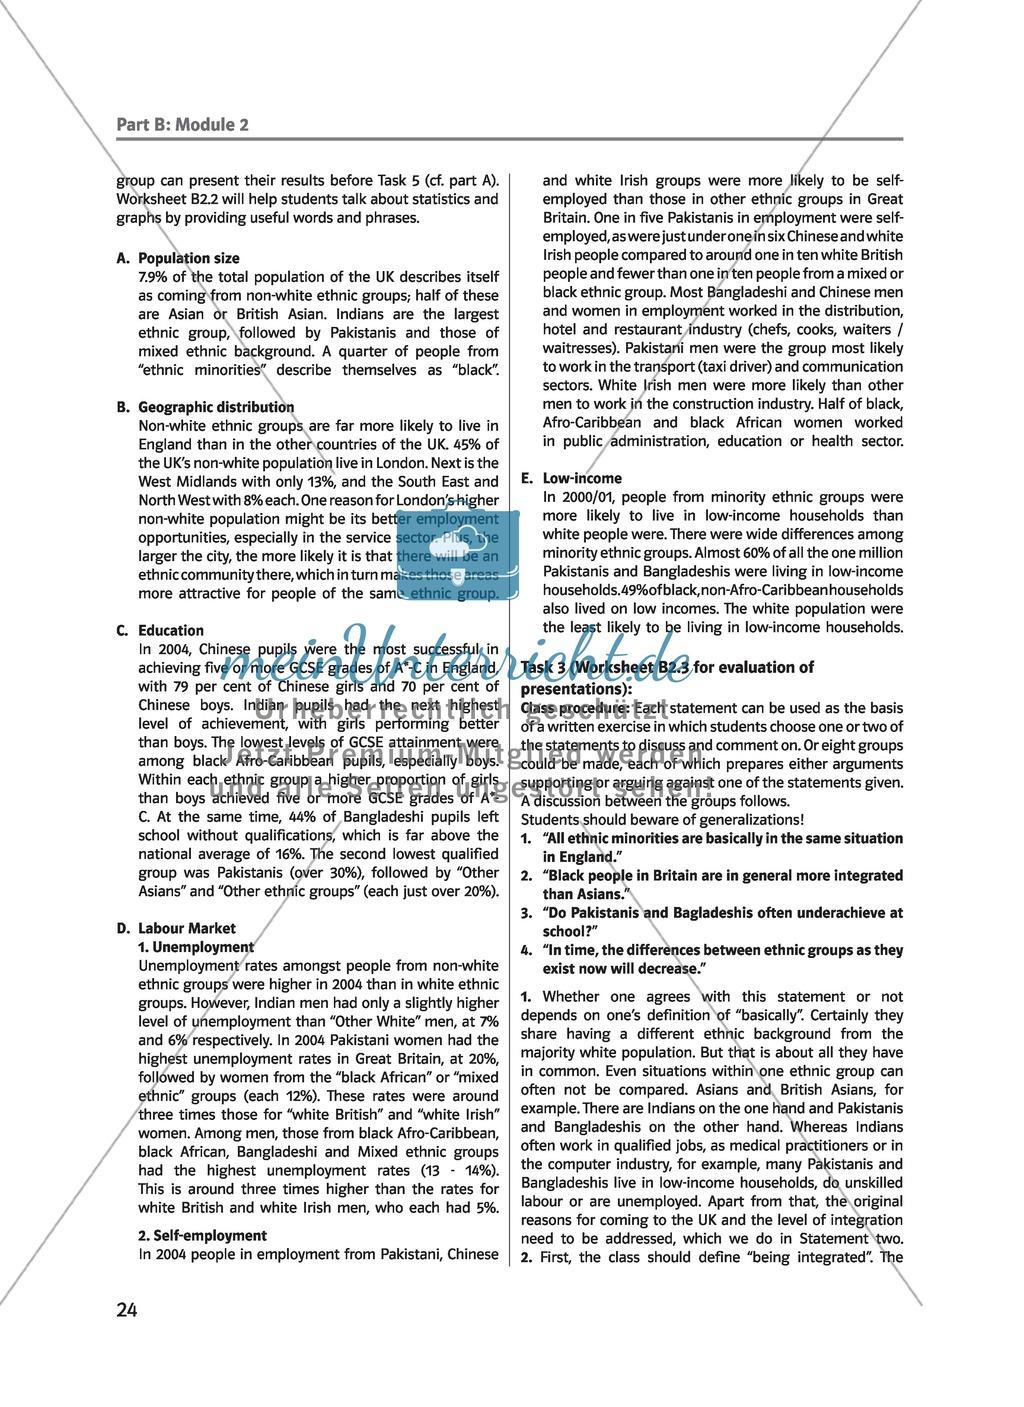 (Un)arranged marriage - Themen für die Oberstufe: Multicultural Britain - Facts and Figures Preview 1